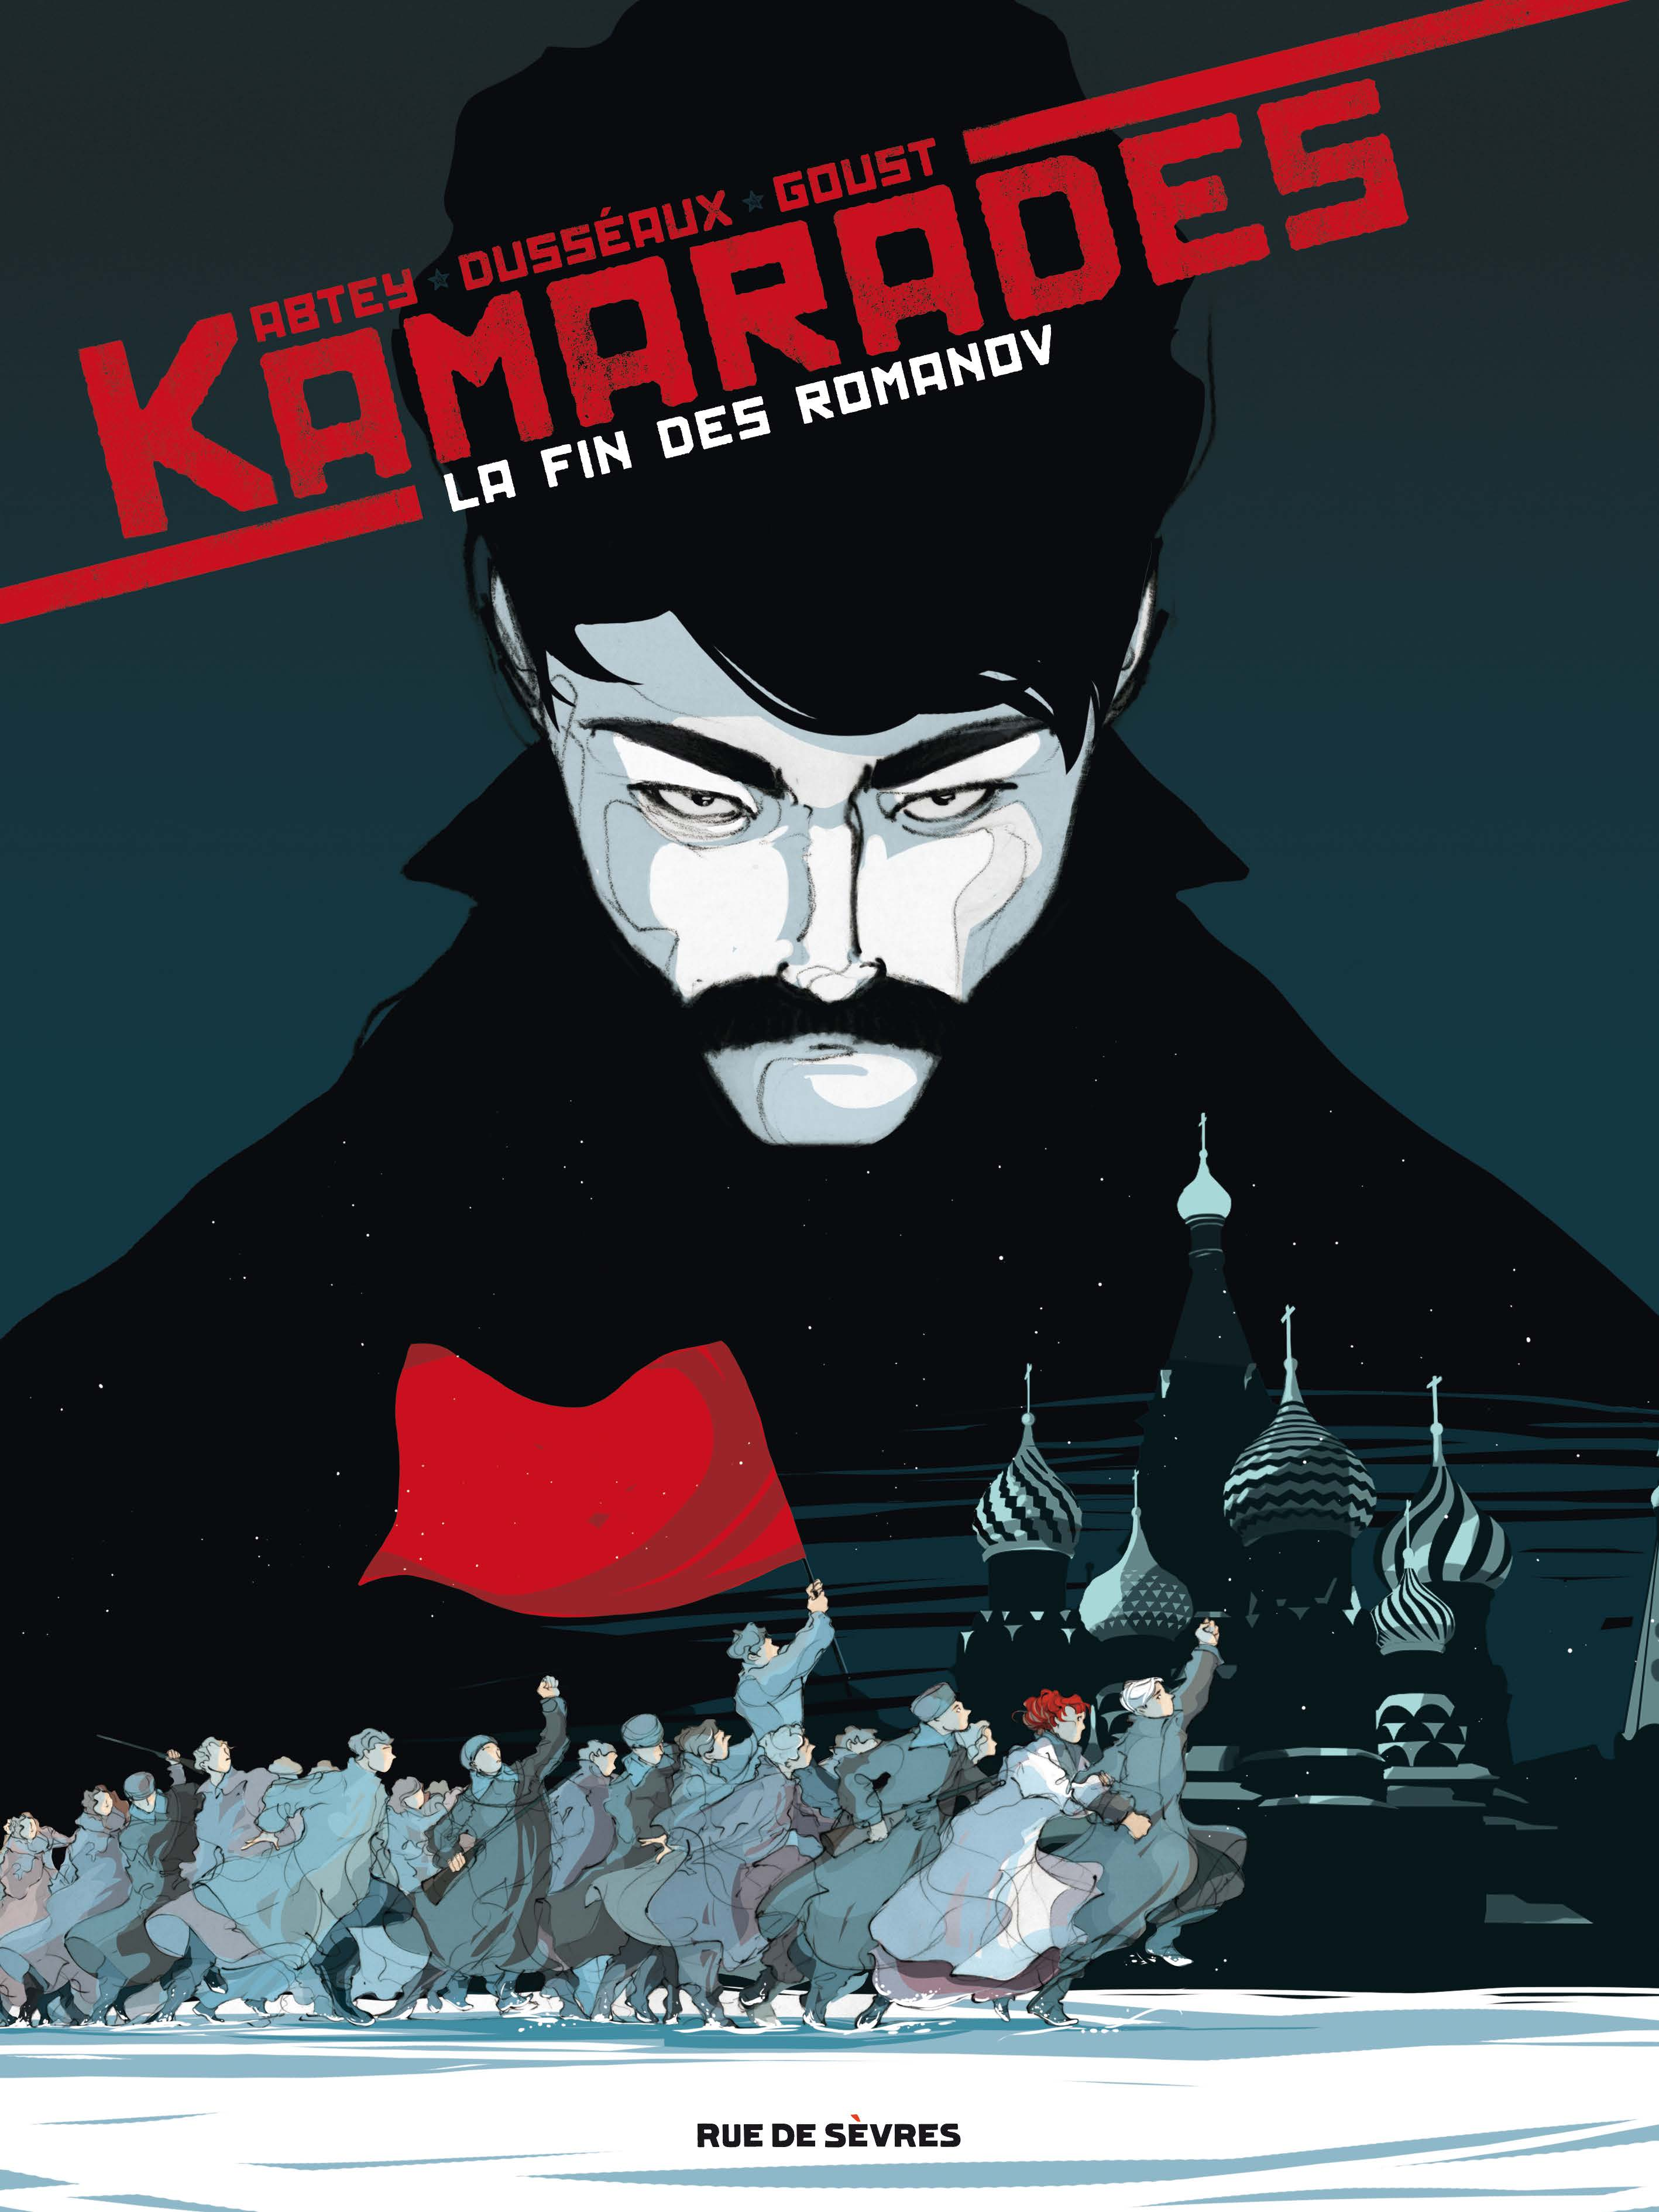 Kamarades, un certain Joseph Djougachvili